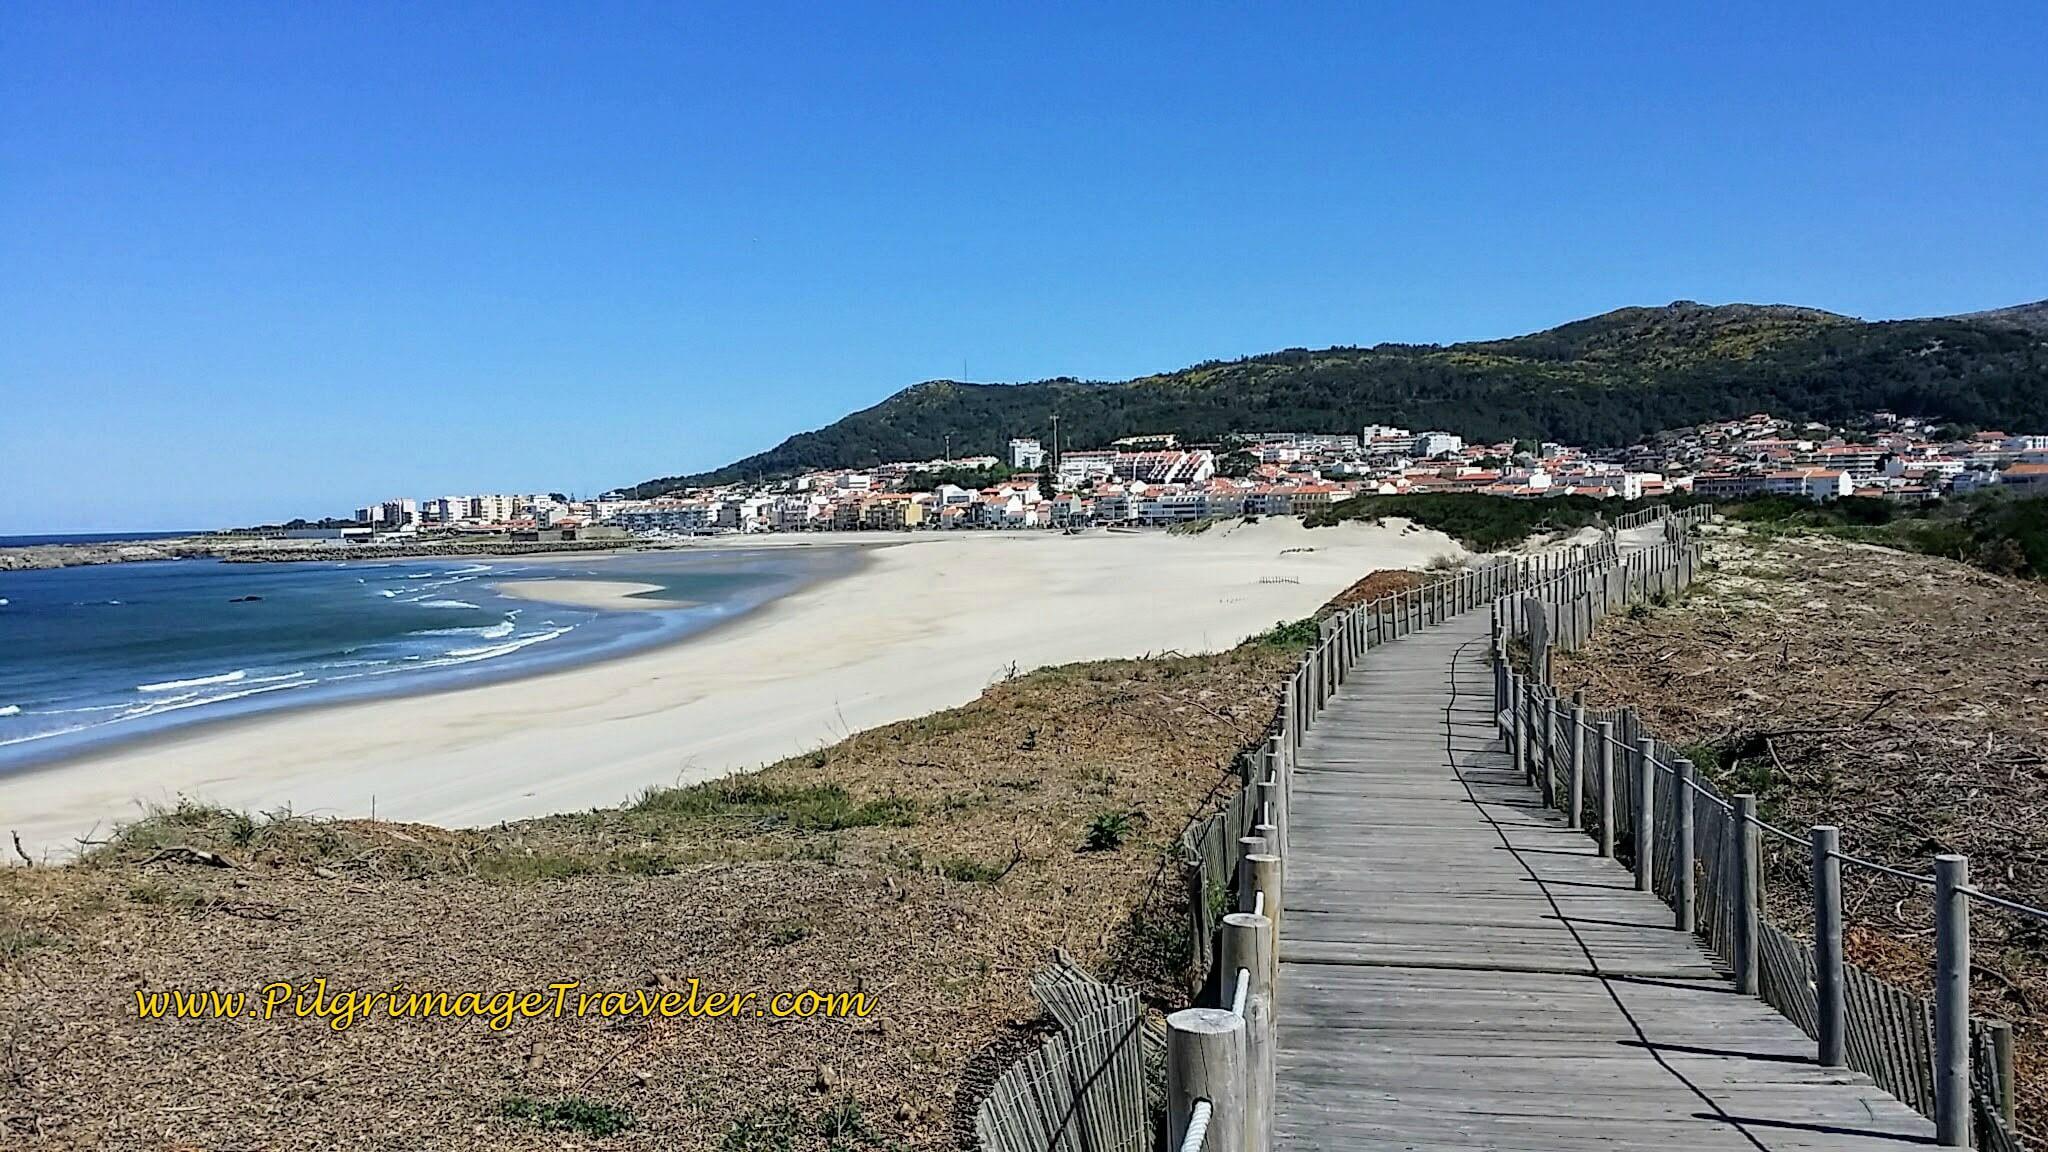 Boardwalks Abound on the Senda Literal, Camino Portugués